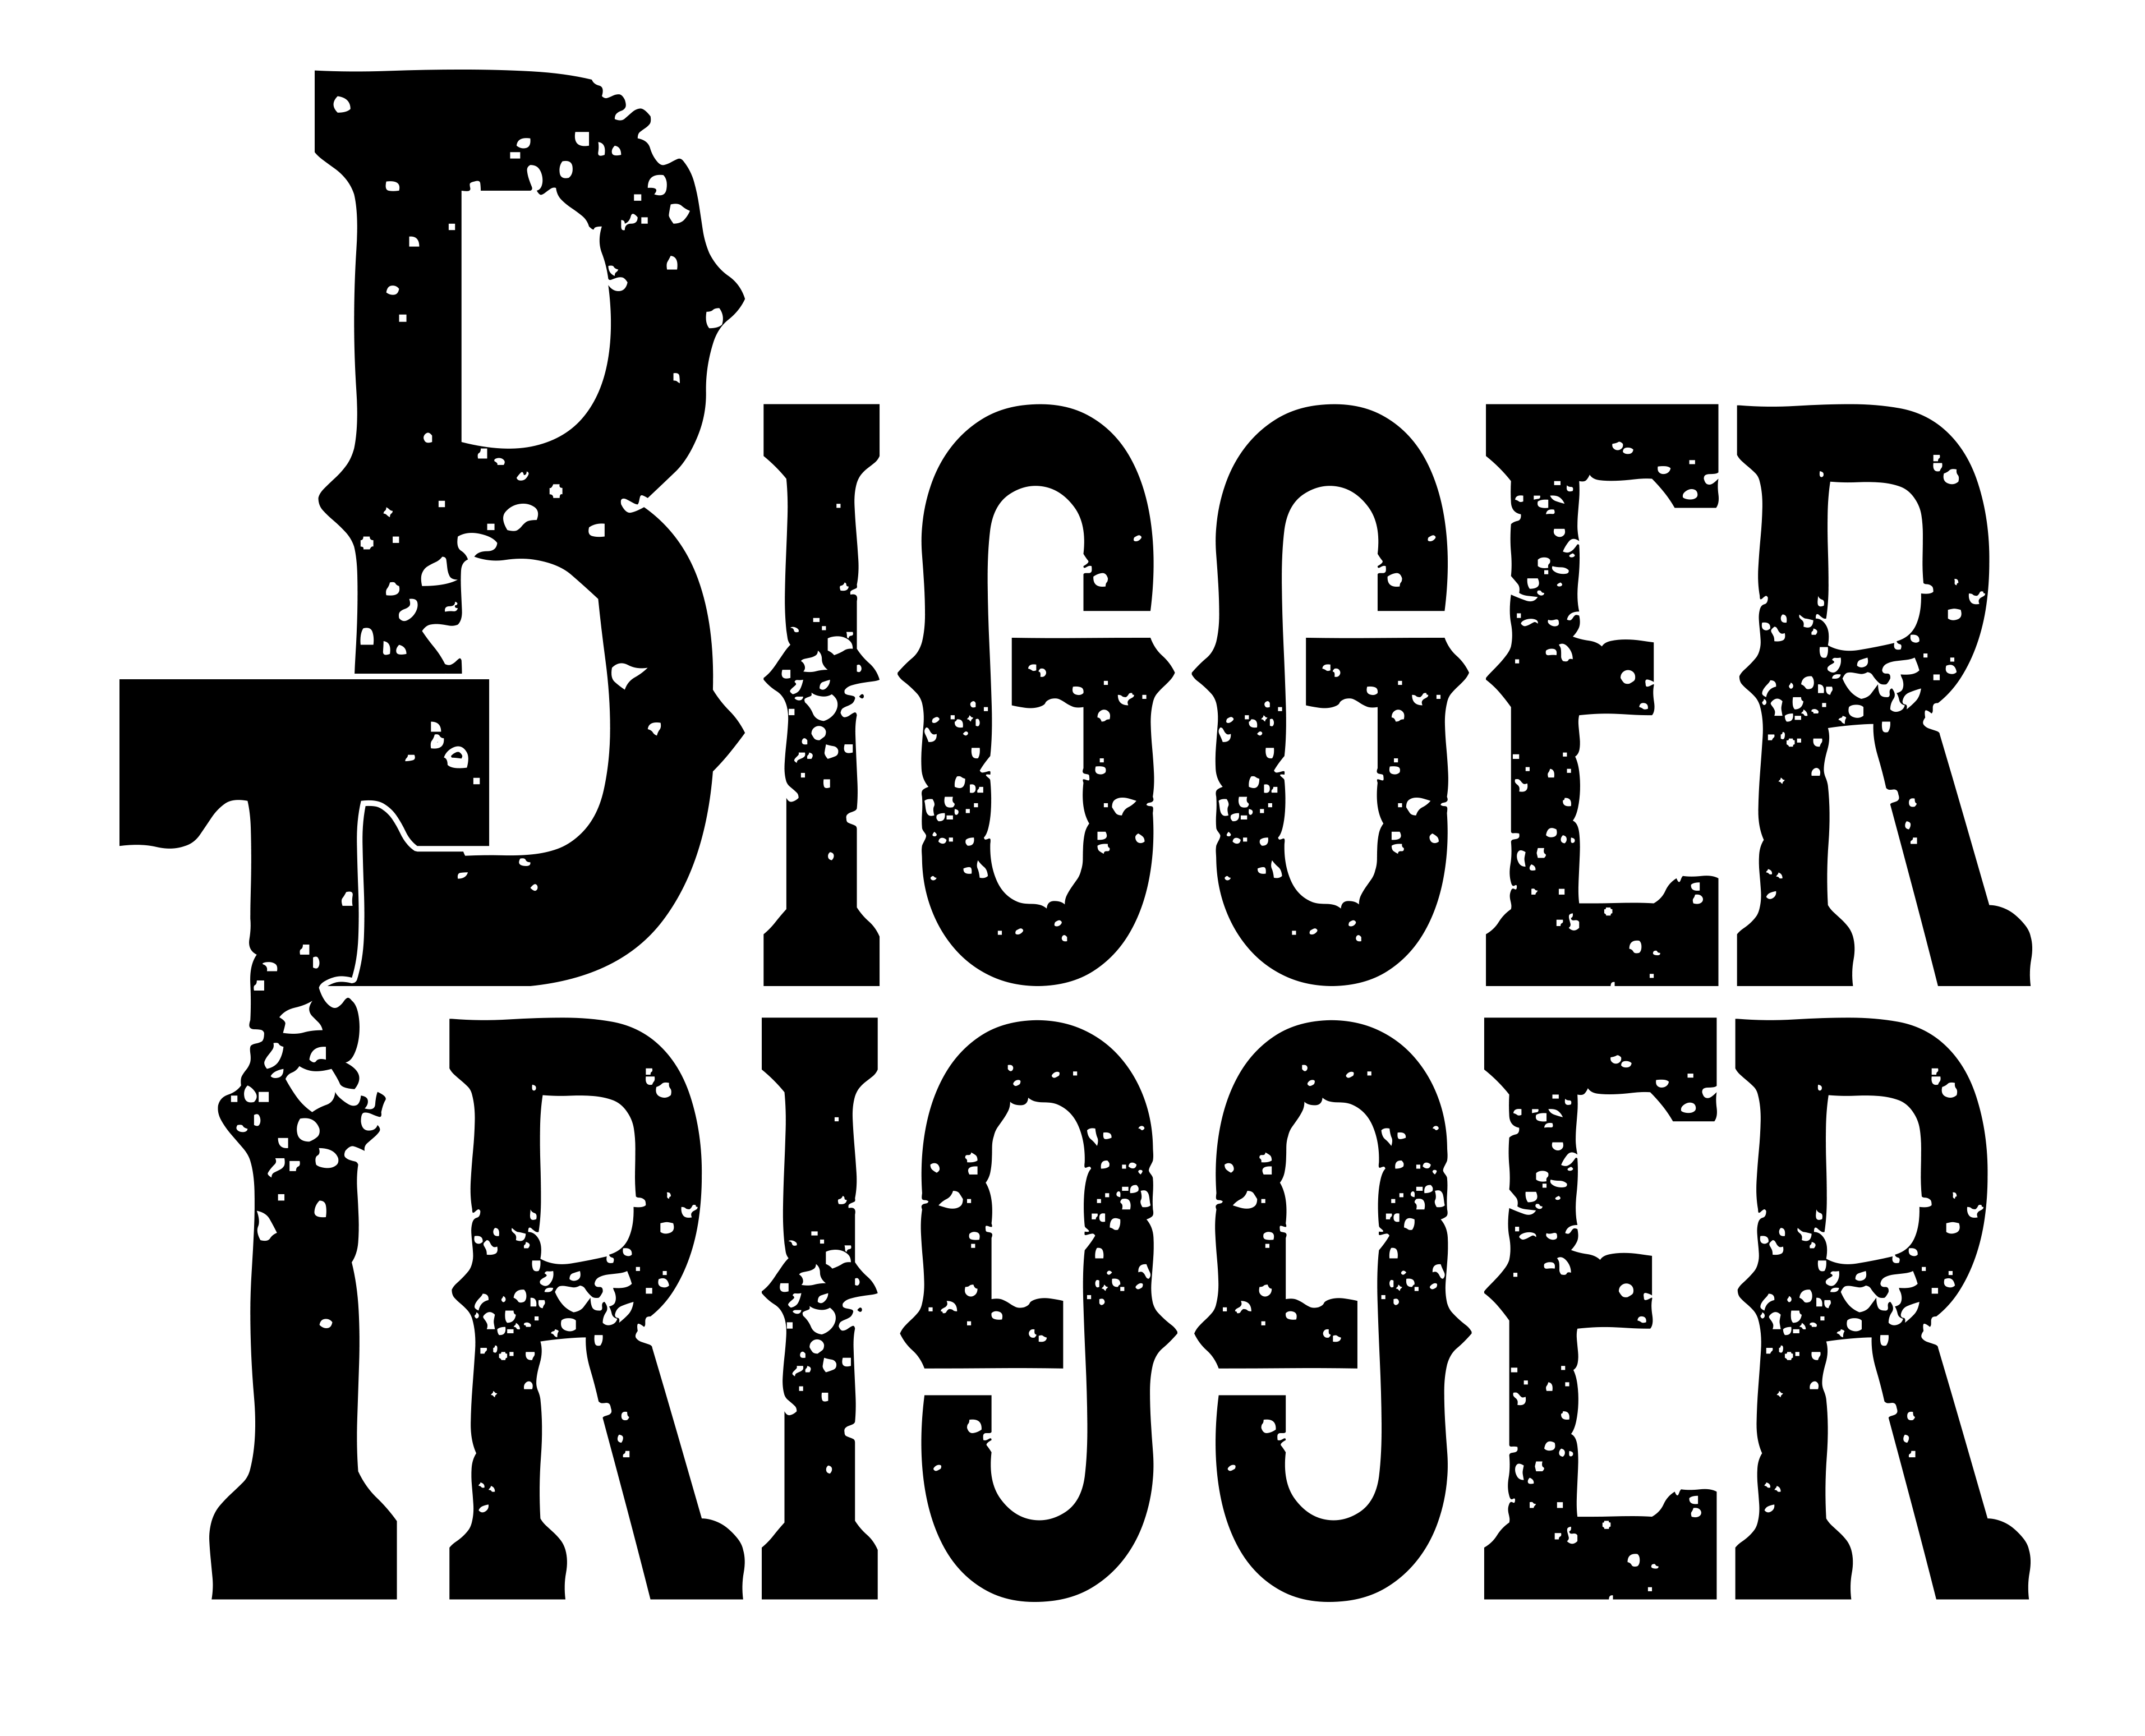 BIGGER TRIGGER